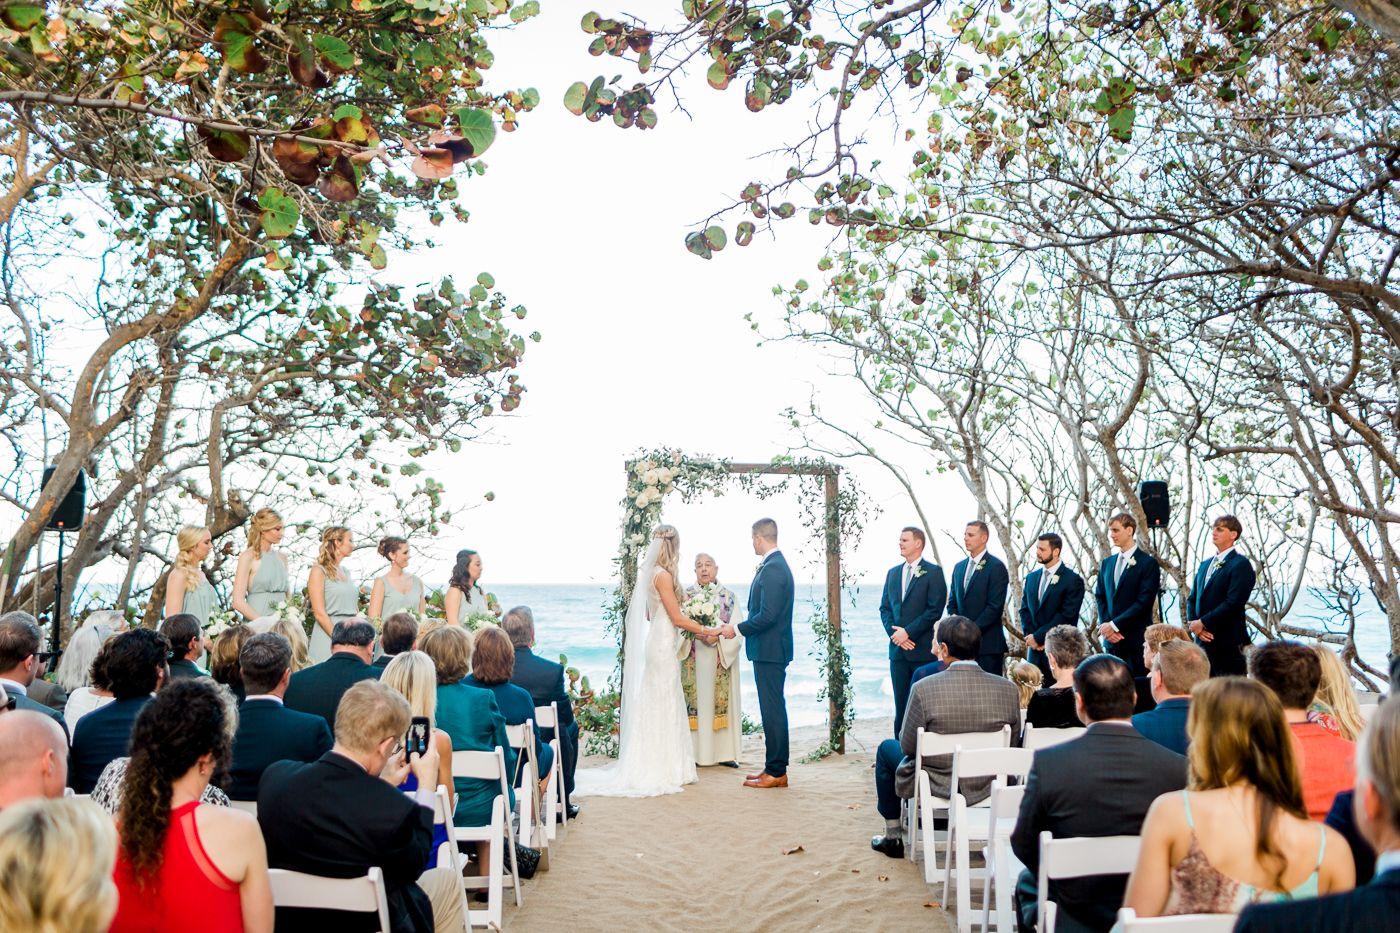 Seaside Organic Jupiter Beach Resort Wedding Lauren Galloway Southwest Florida Film Wedding Lifestyle Photographer In 2020 Jupiter Beach Resort Jupiter Beach Resort Wedding